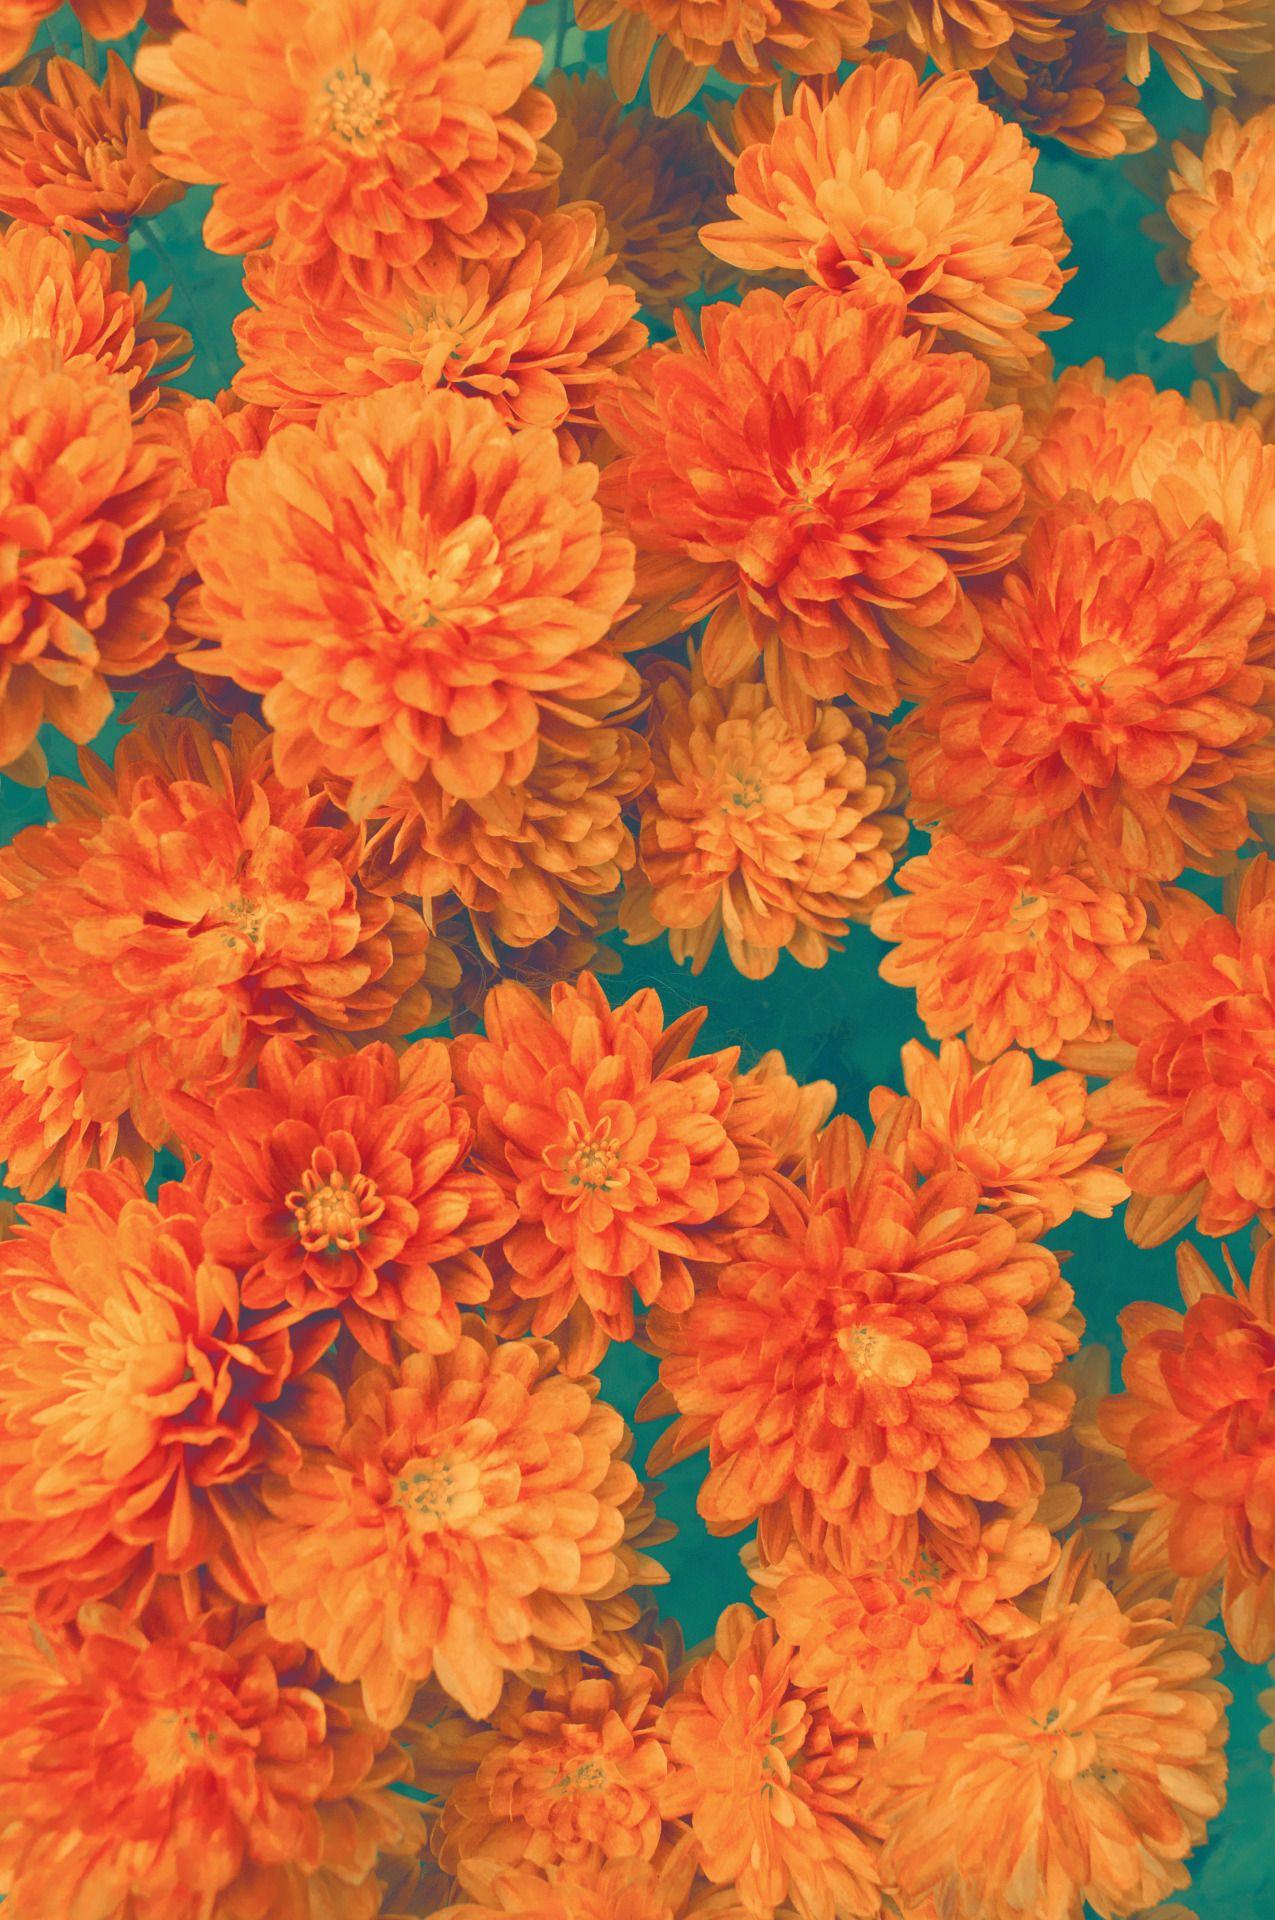 Vintage Patterns Photo Orange Aesthetic Orange Wallpaper Aesthetic Wallpapers